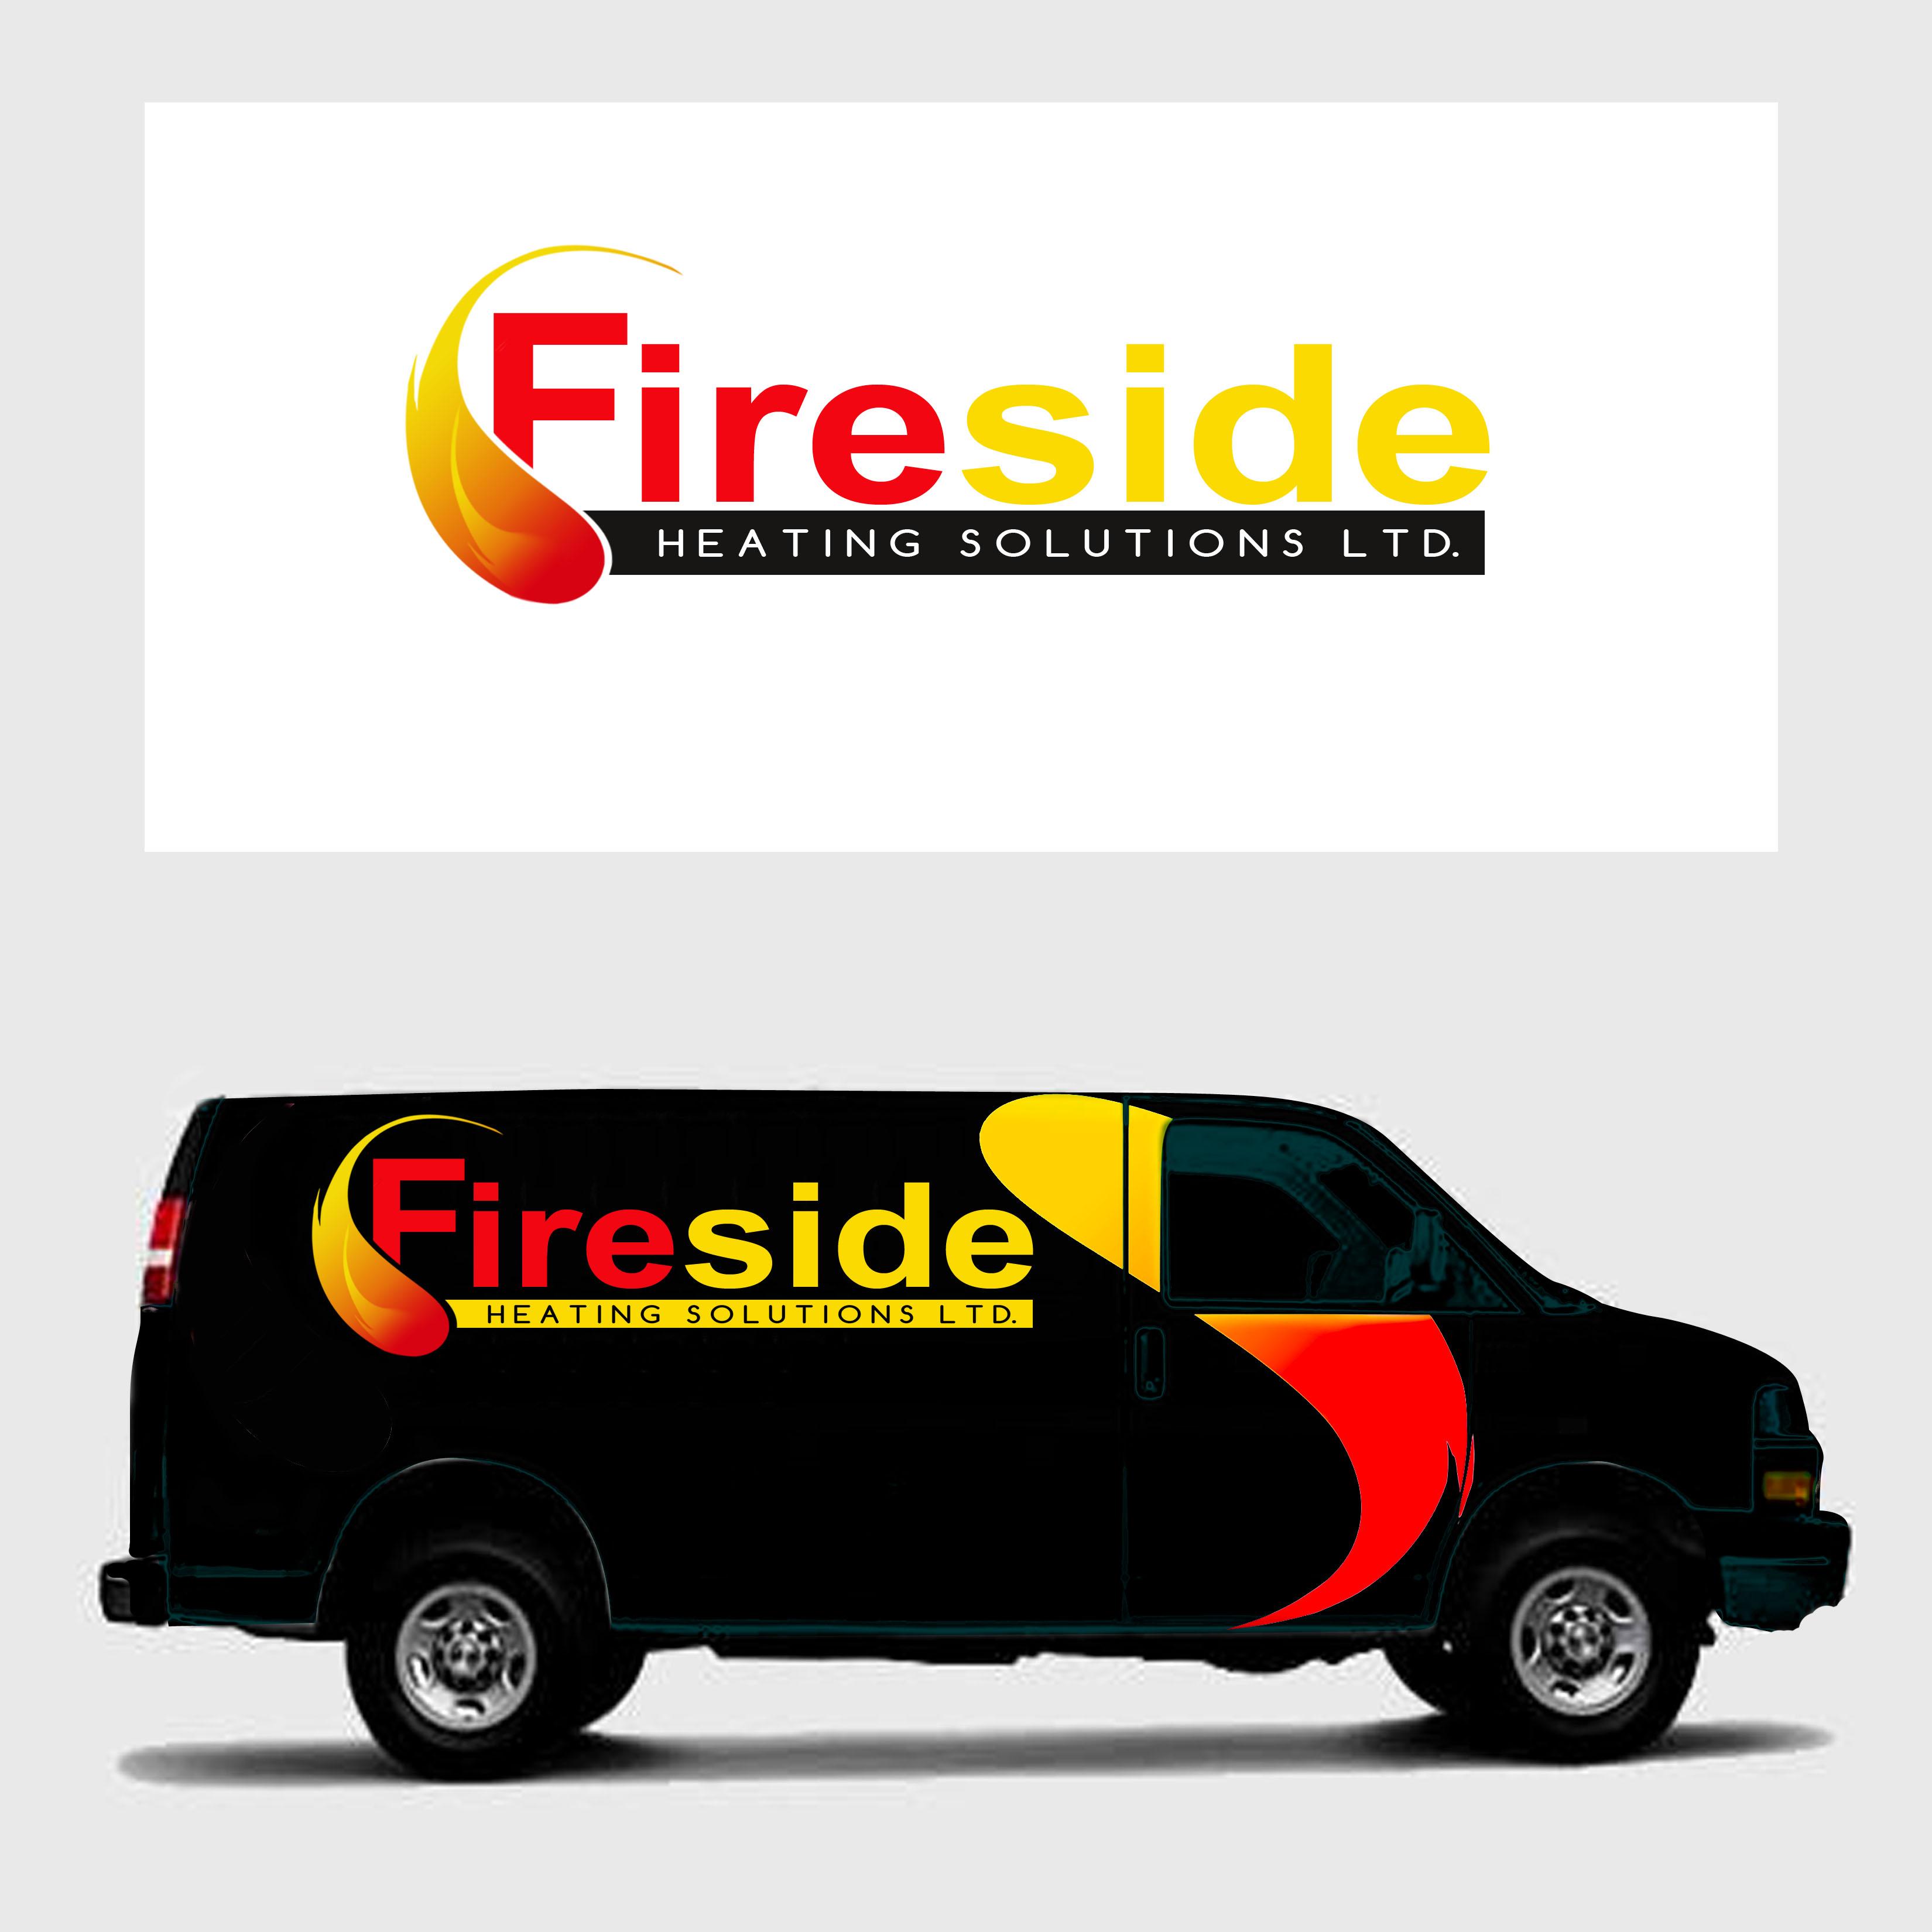 Logo Design by Allan Esclamado - Entry No. 59 in the Logo Design Contest Creative Logo Design for Fireside Heating Solutions Ltd..